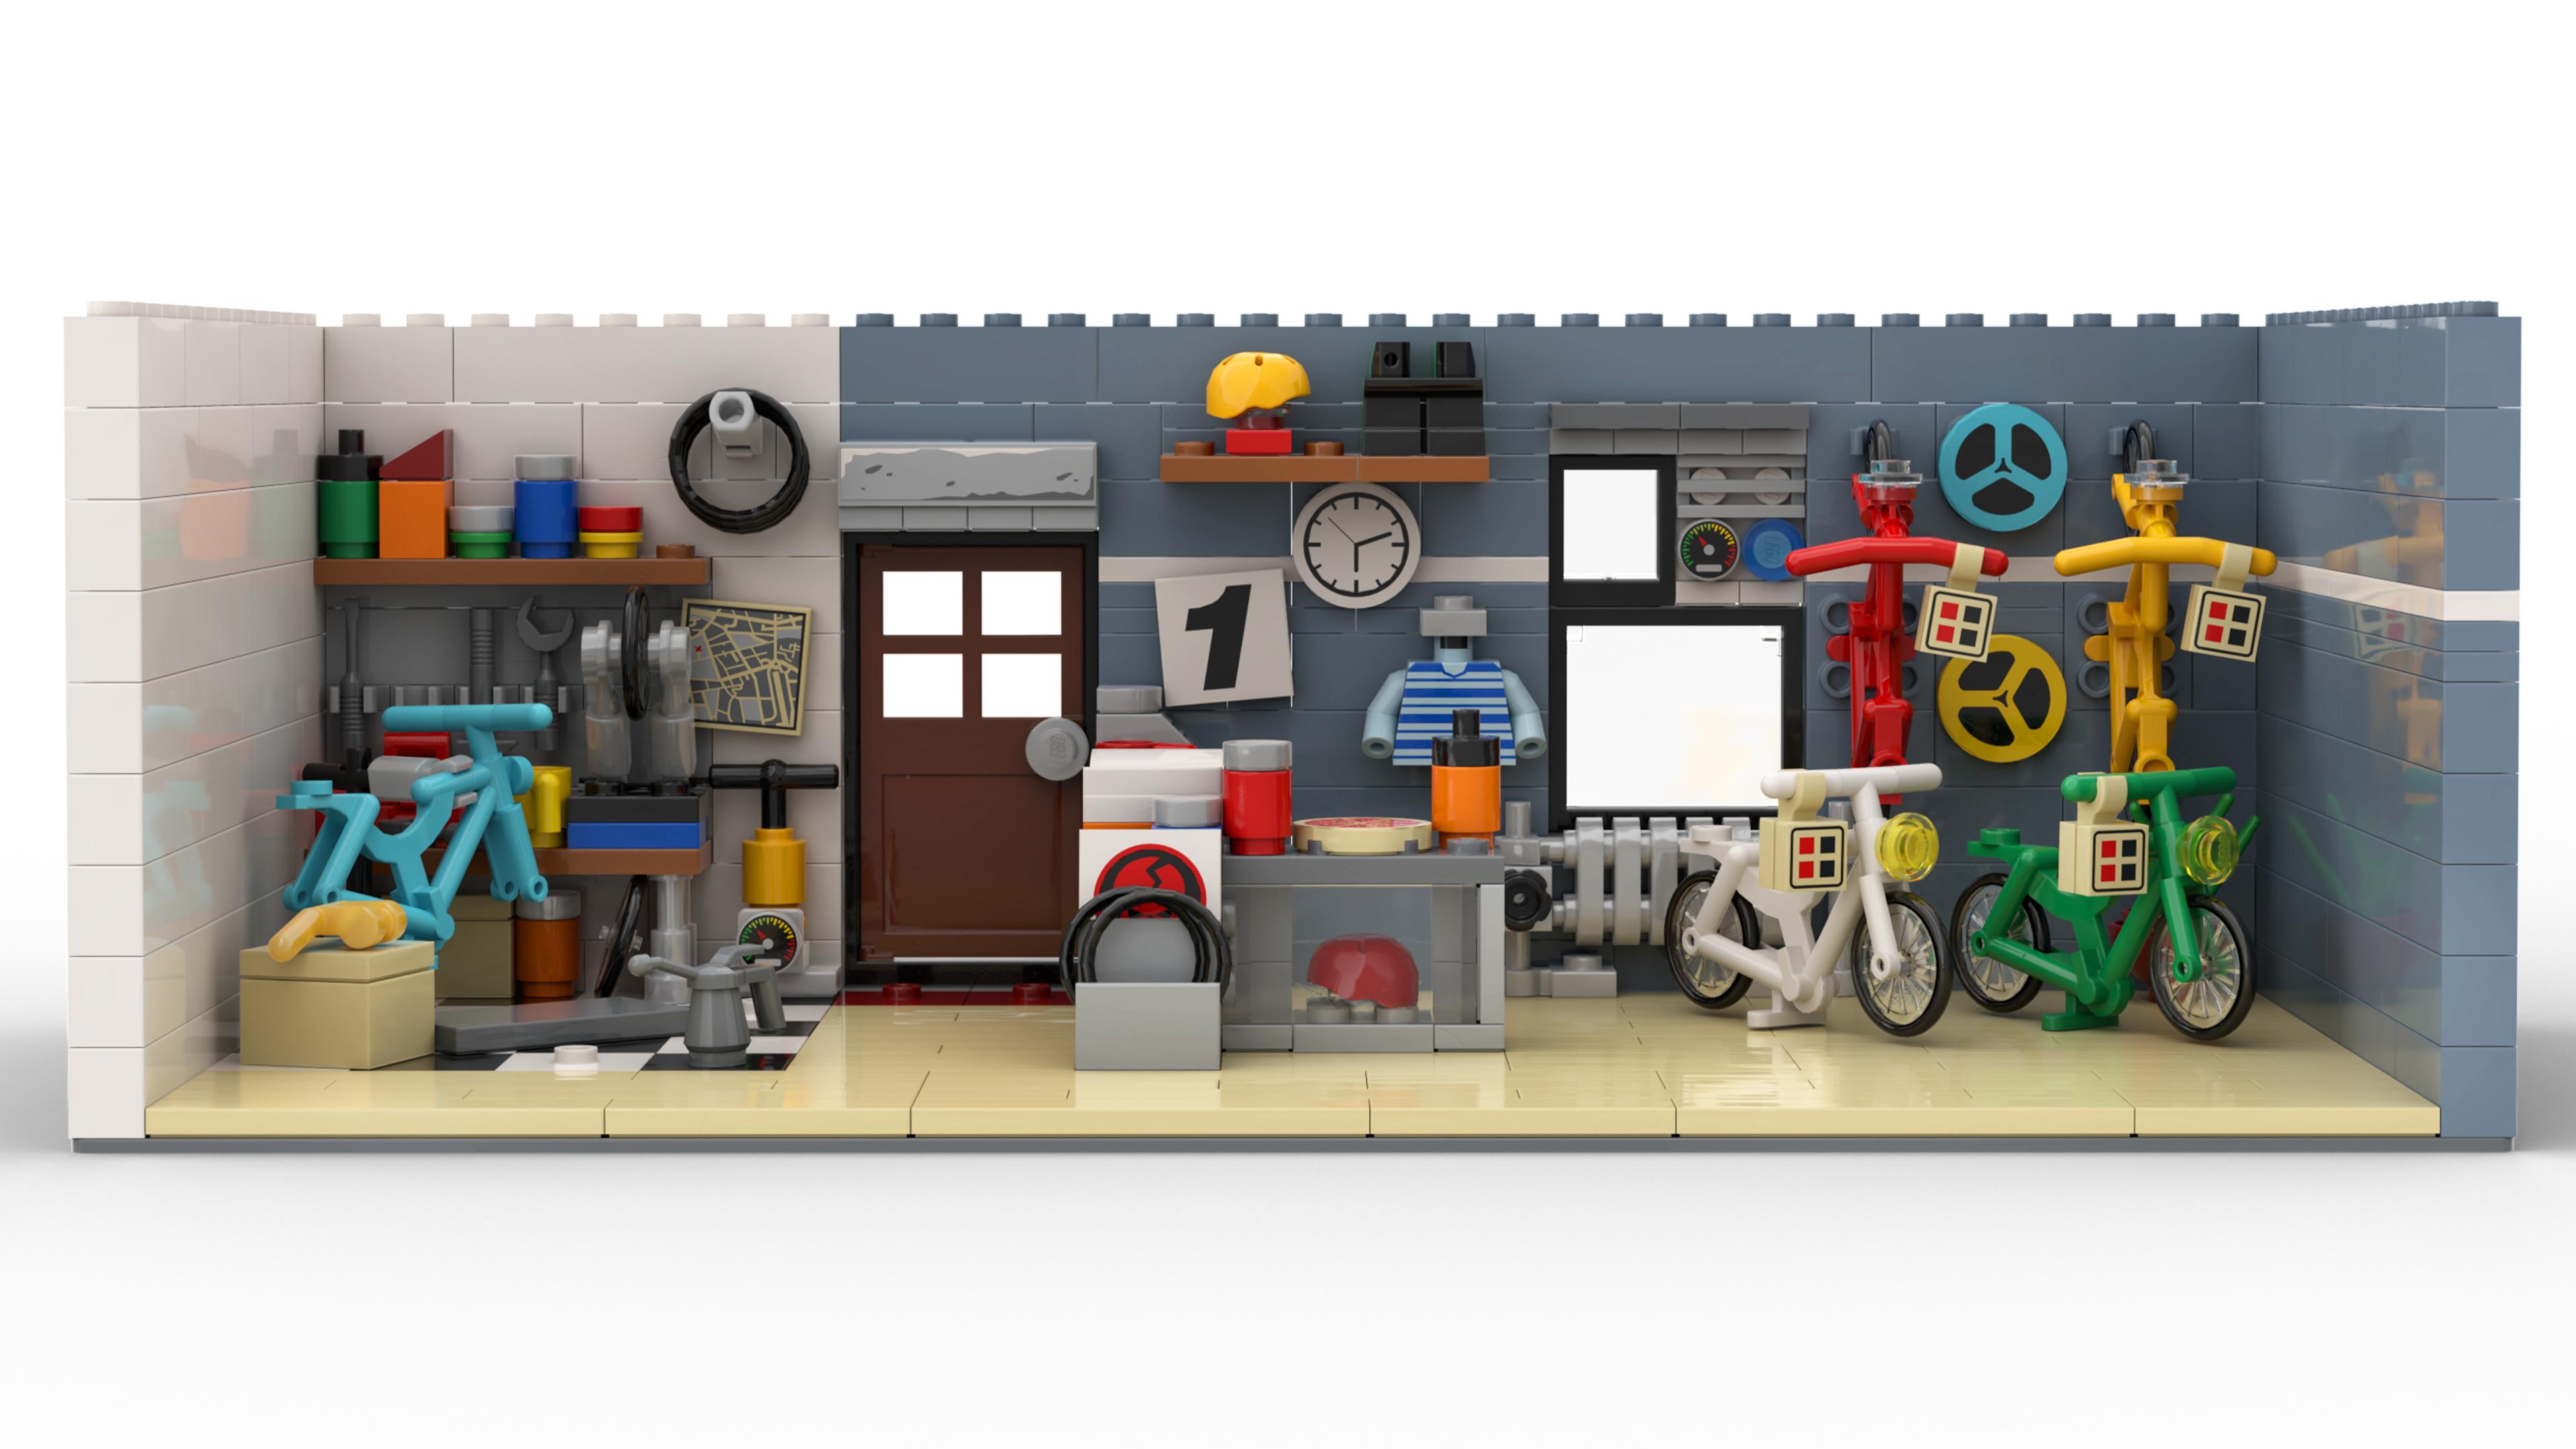 https://ideascdn.lego.com/community/lego_ci/activity_field_attachments/120/6239083-BikeShop_Cover.jpg